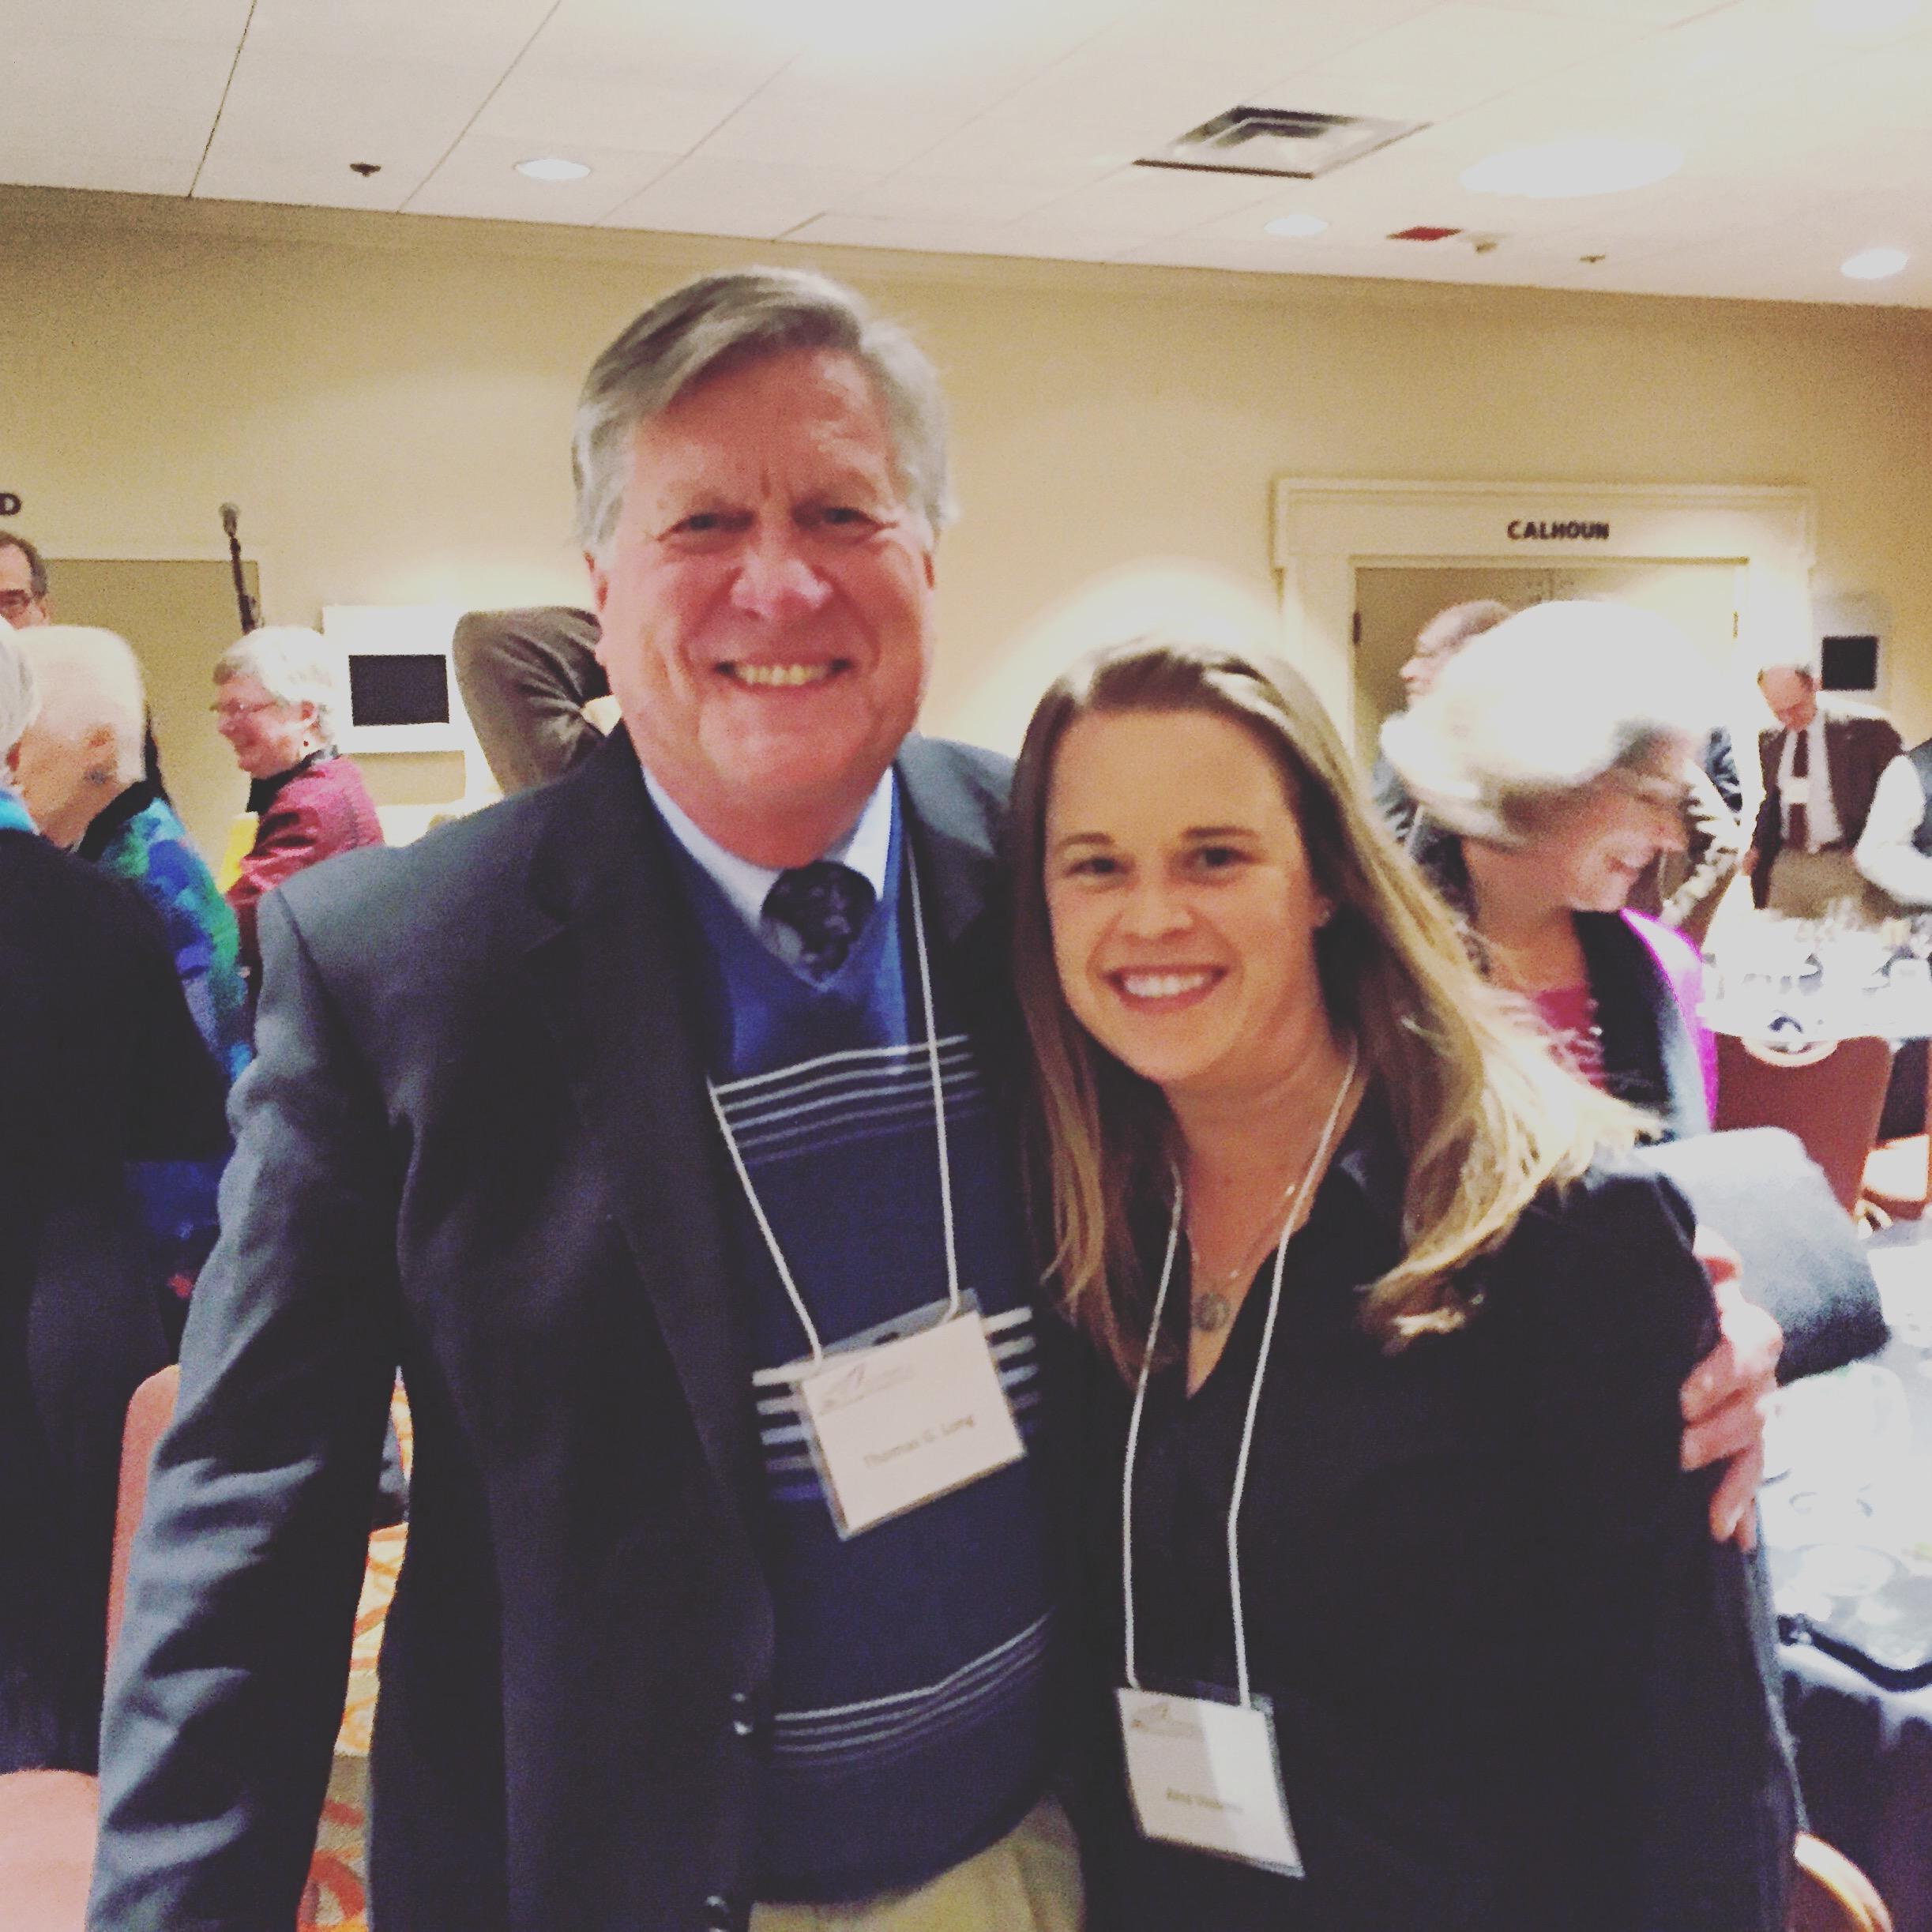 Dr. Tom Long/The Academy of Homiletics, Nashville, TN, 2014